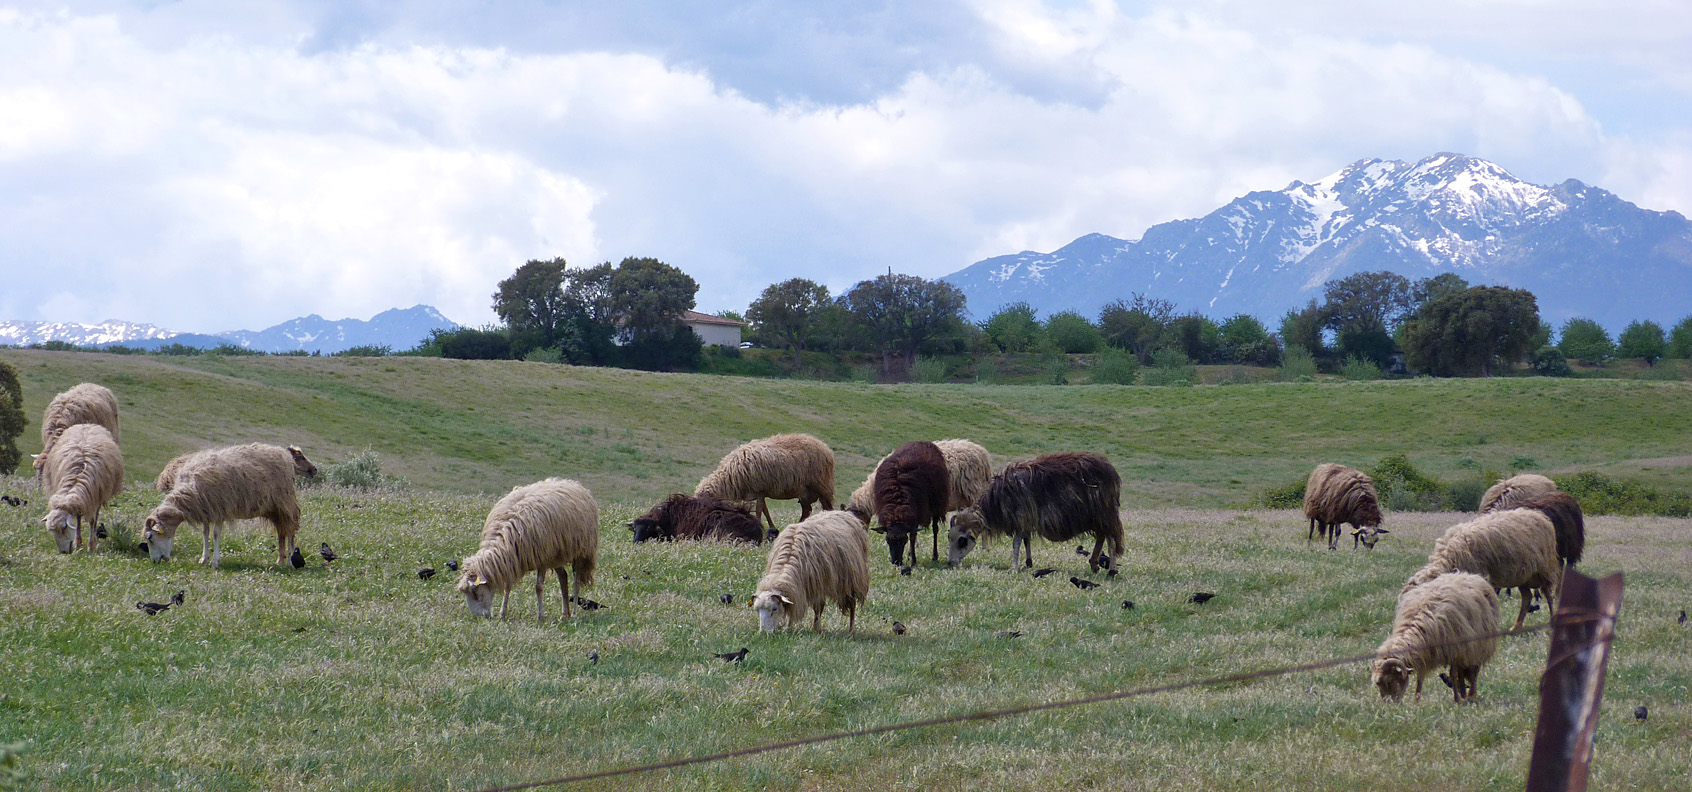 Spotless Starlings feeding amongst sheep, Etang d'Urbino